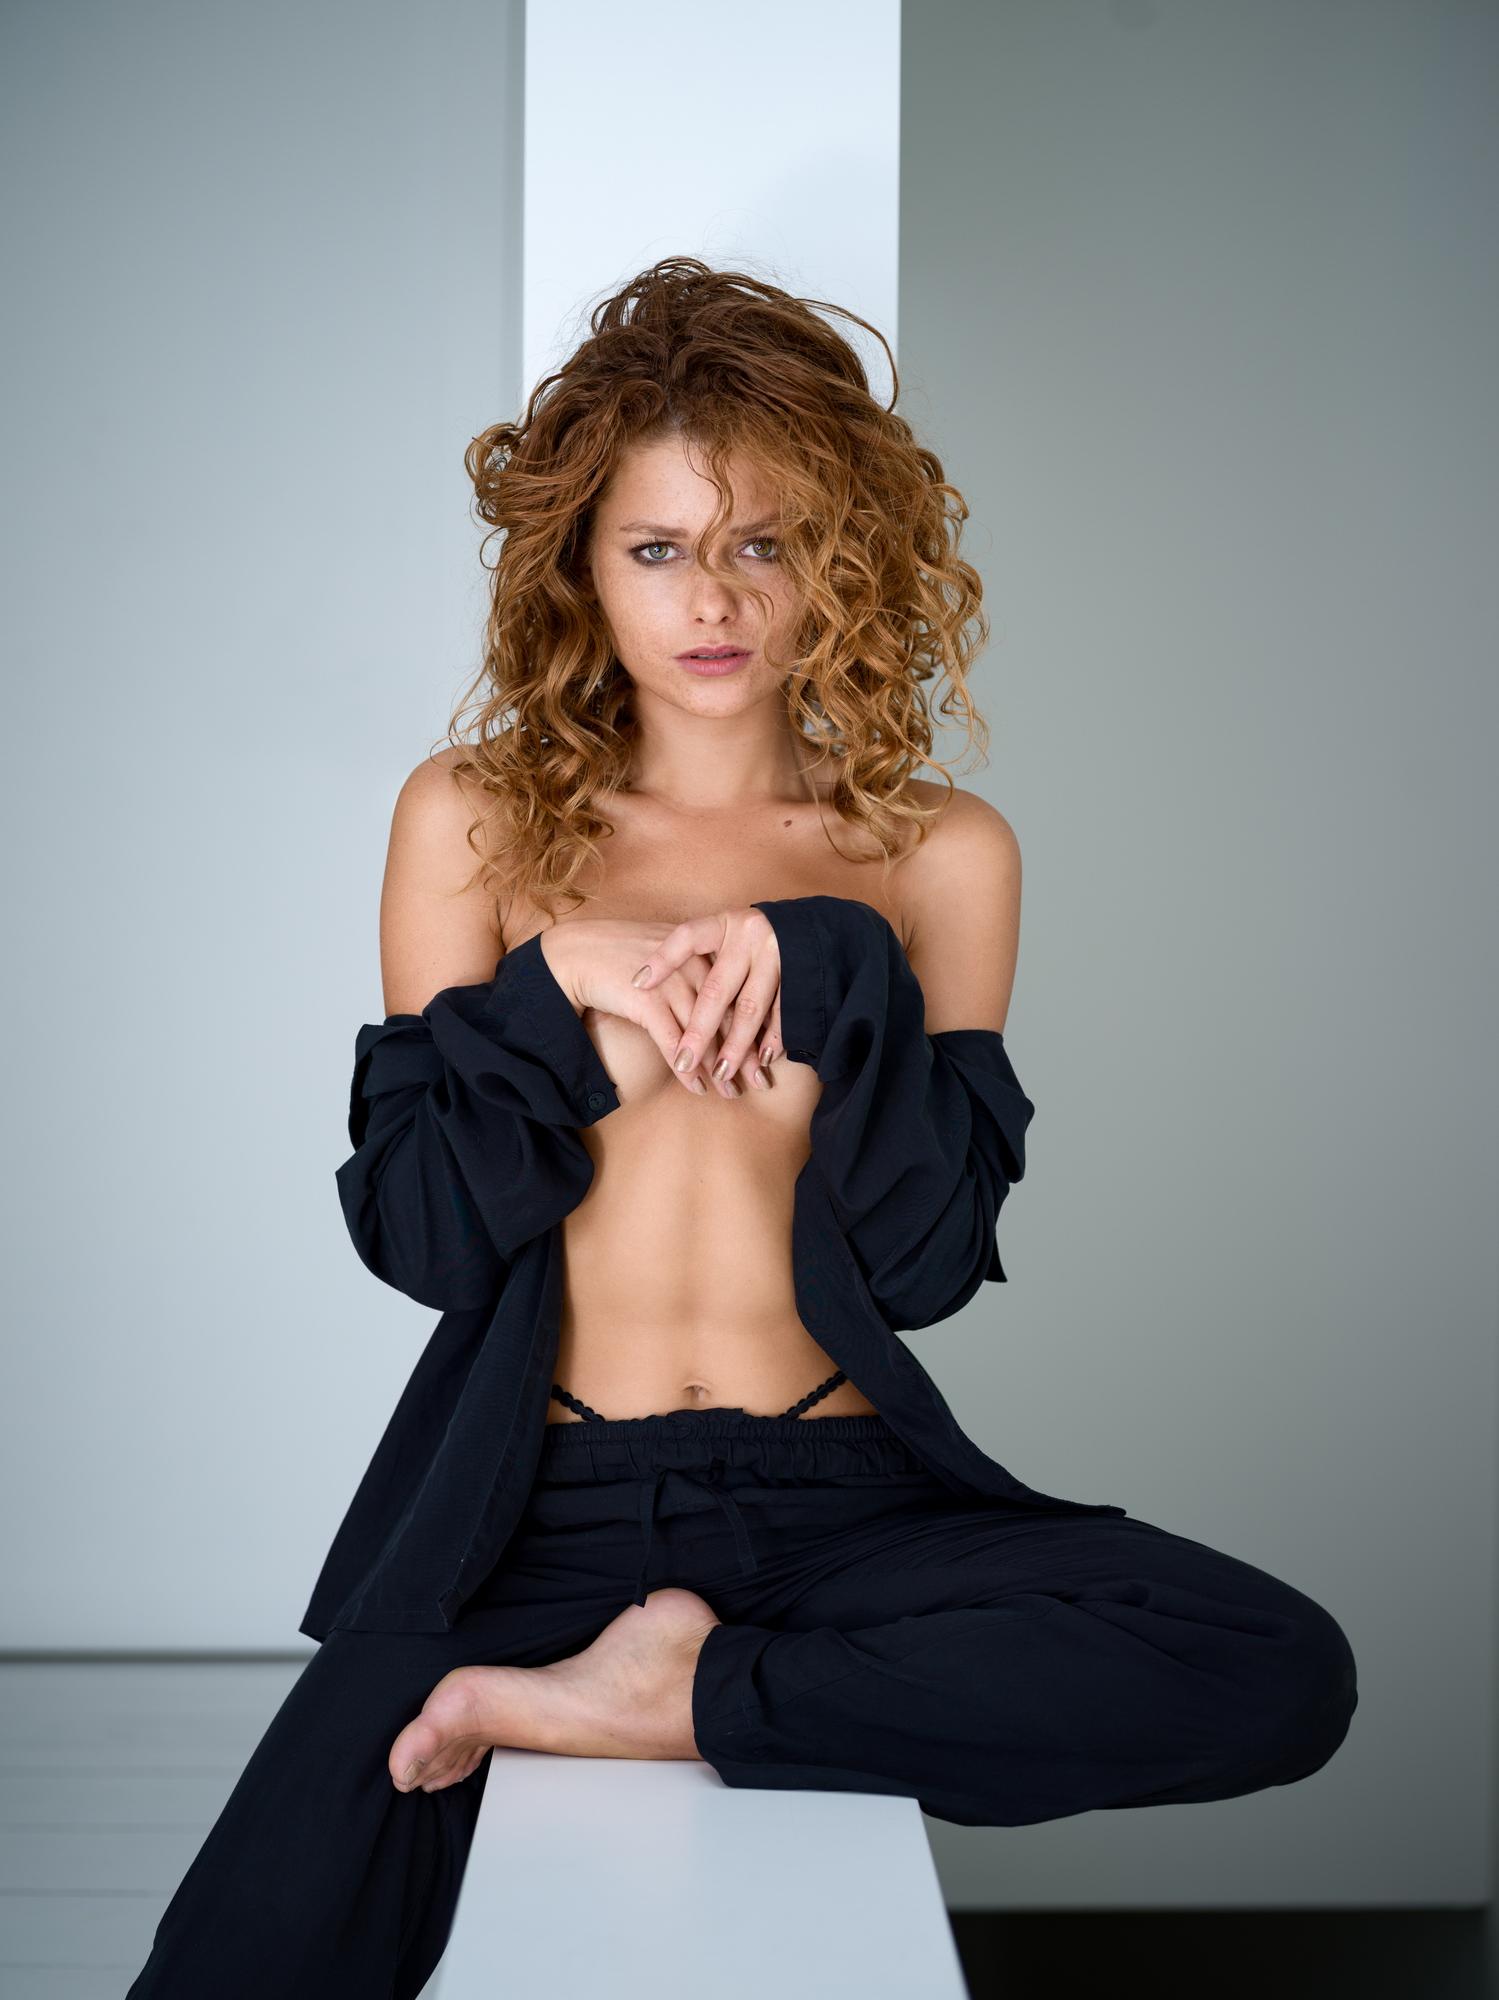 julia-yaroshenko-redhead-erotic-model-freckles-nude-lennylw-07